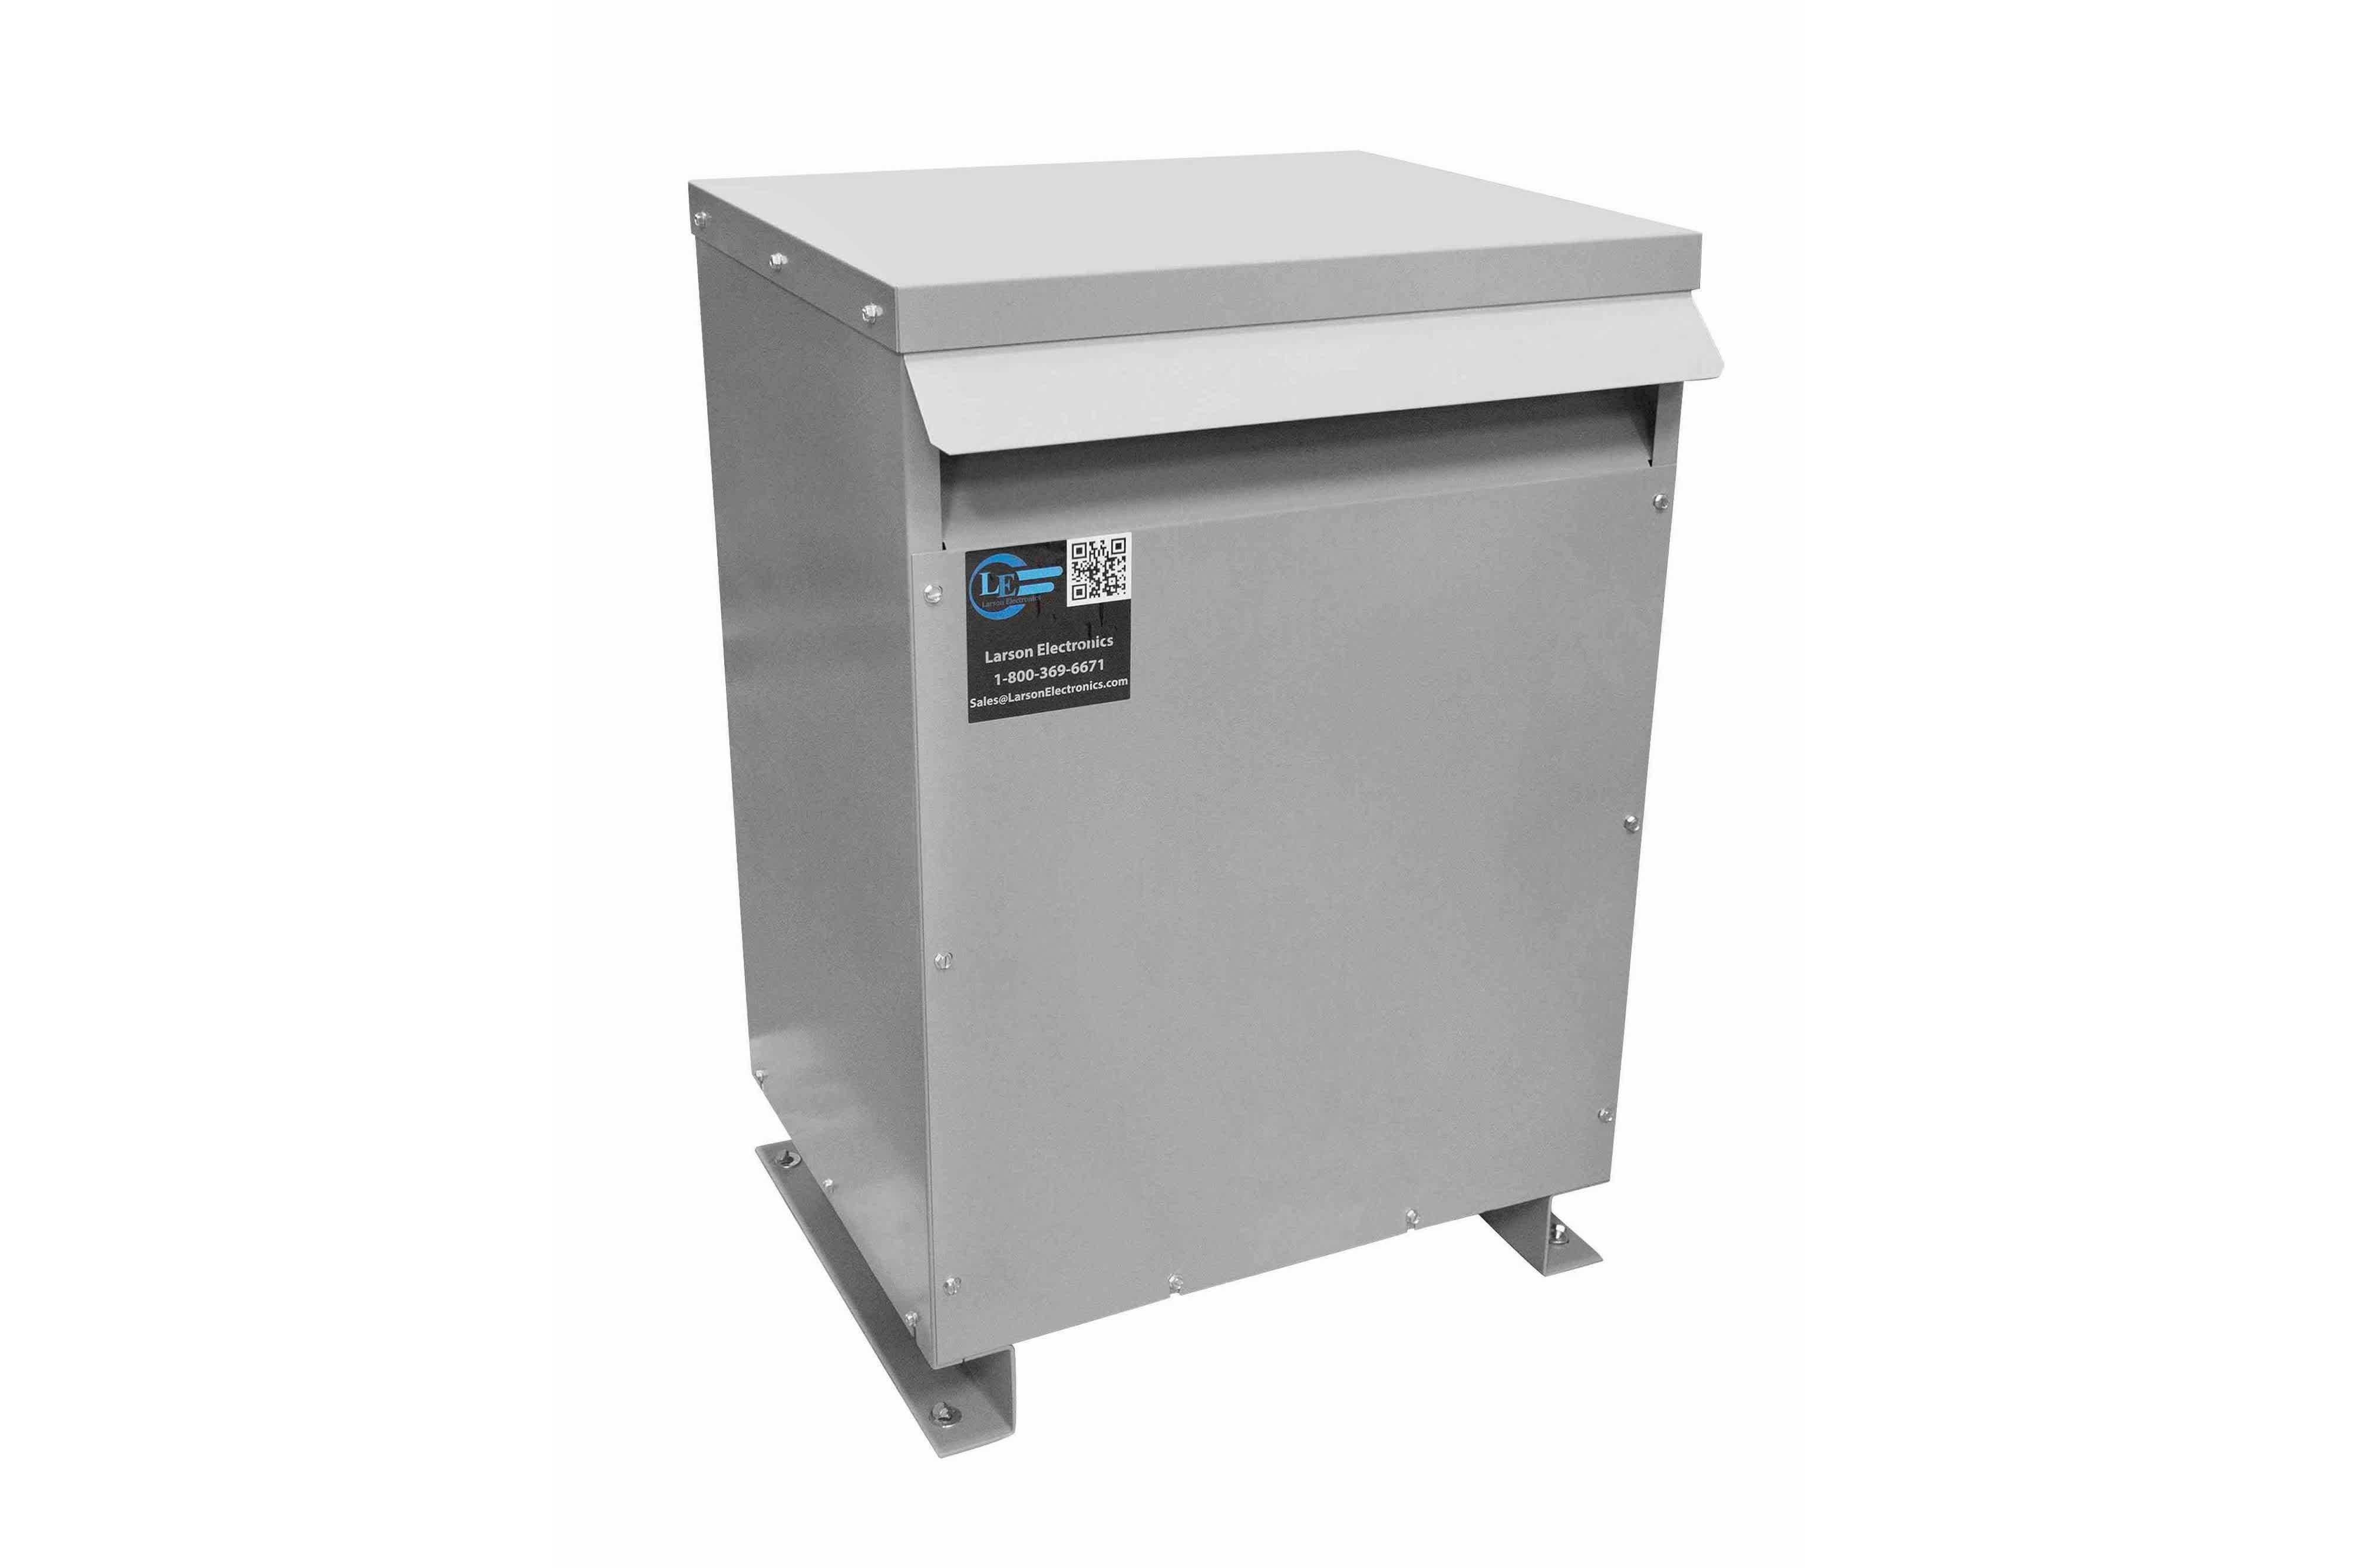 13 kVA 3PH Isolation Transformer, 240V Wye Primary, 380V Delta Secondary, N3R, Ventilated, 60 Hz